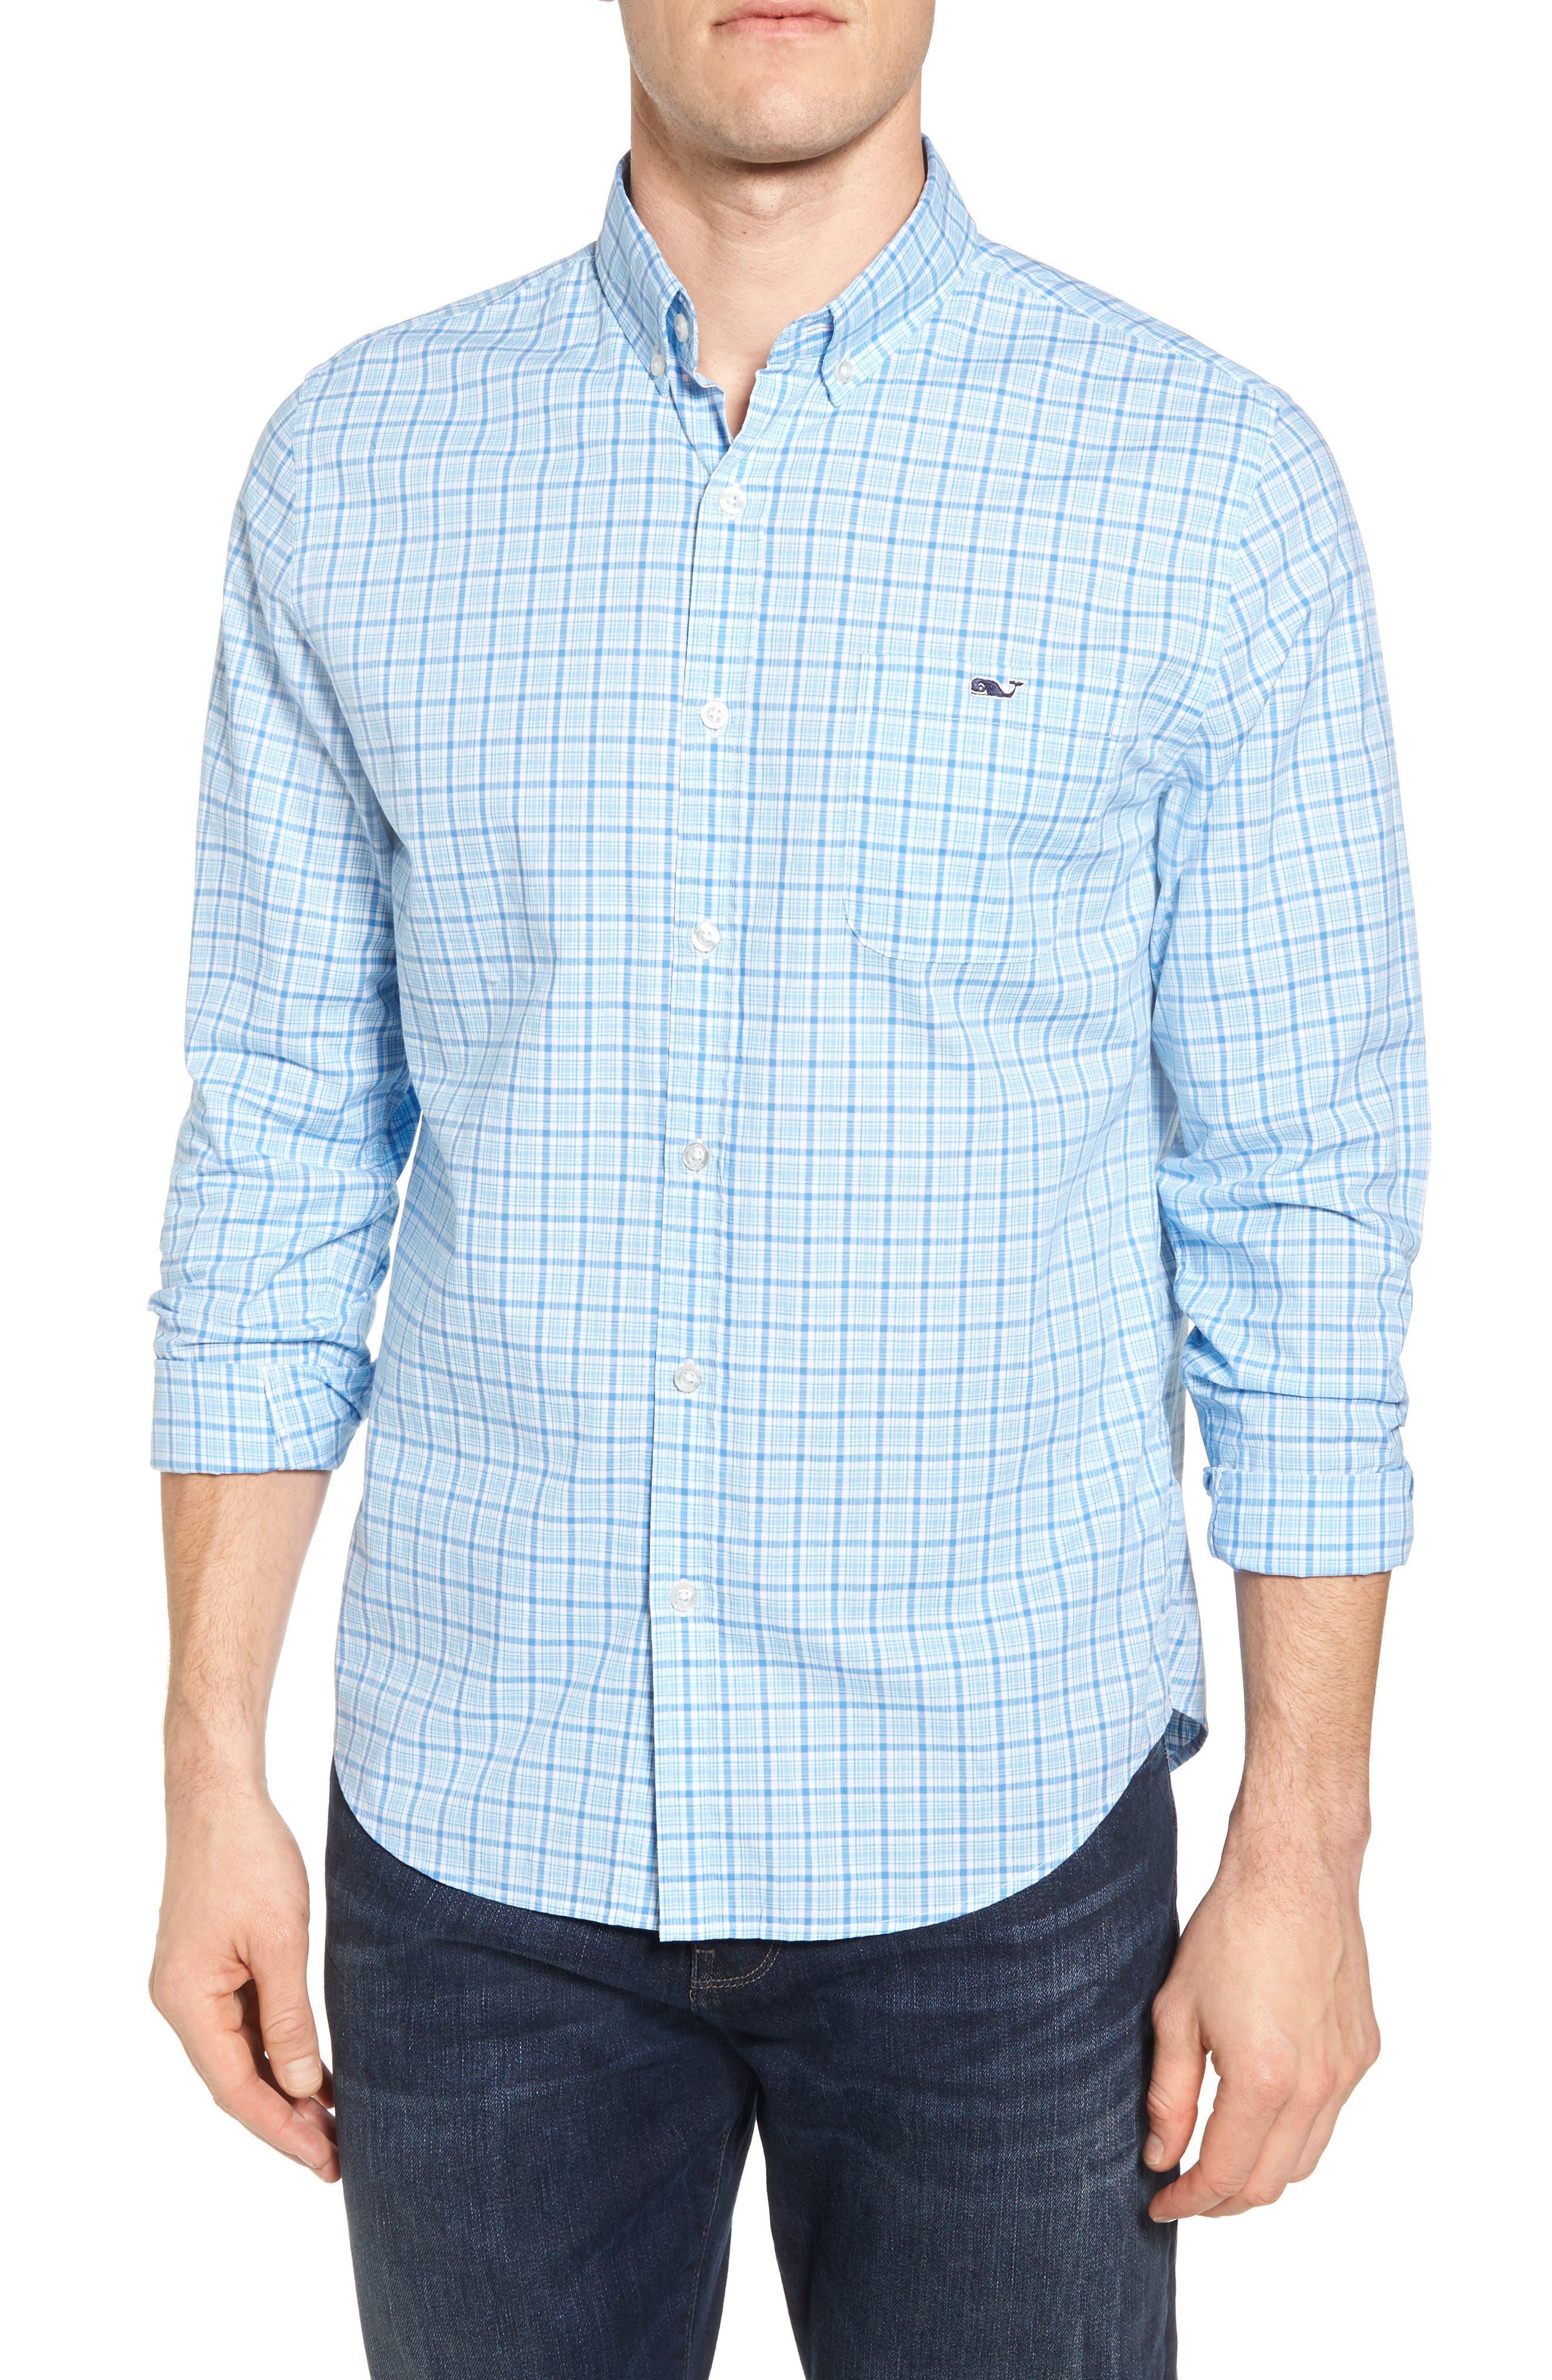 Seawatch Slim Fit Plaid Sport Shirt,                         Main,                         color, Turquoise